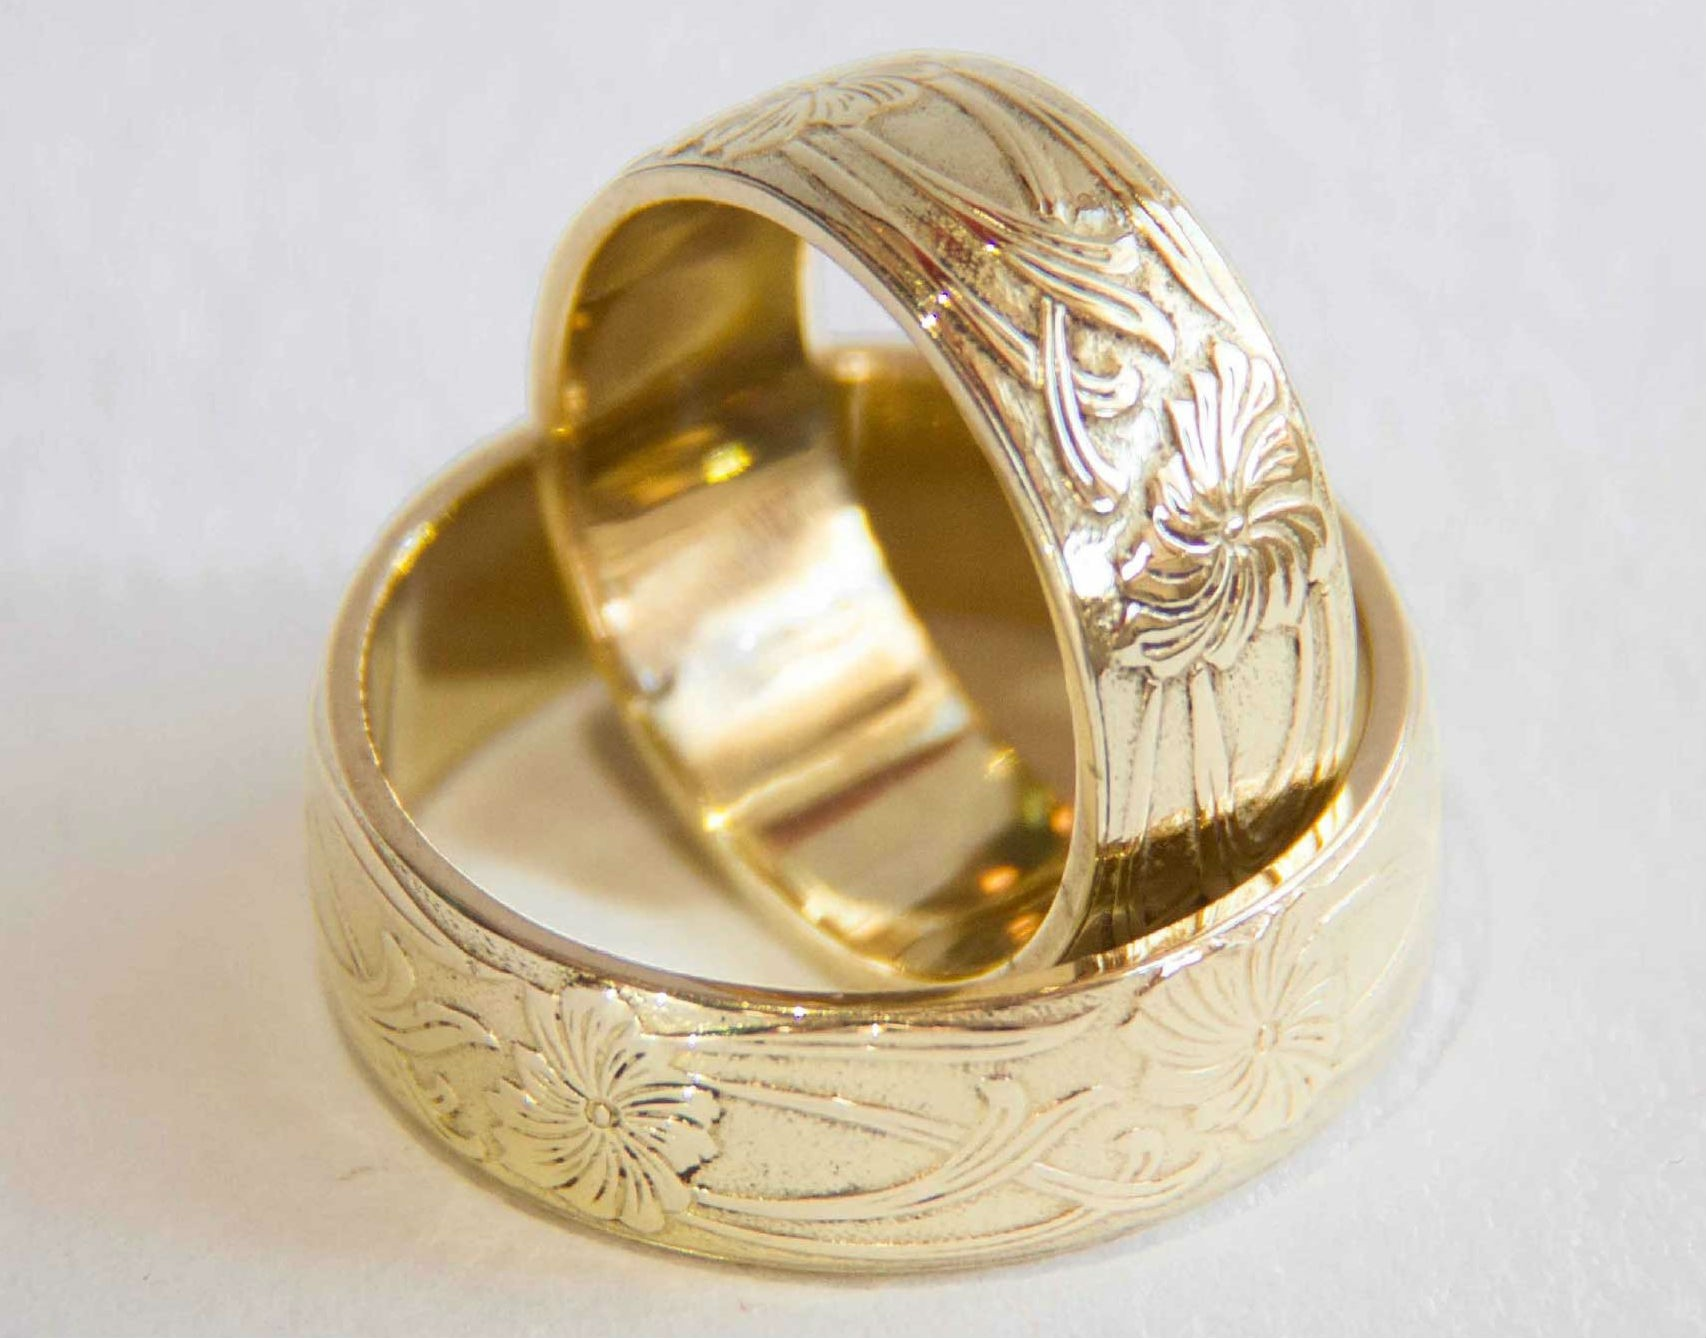 Poročna prstana Rože